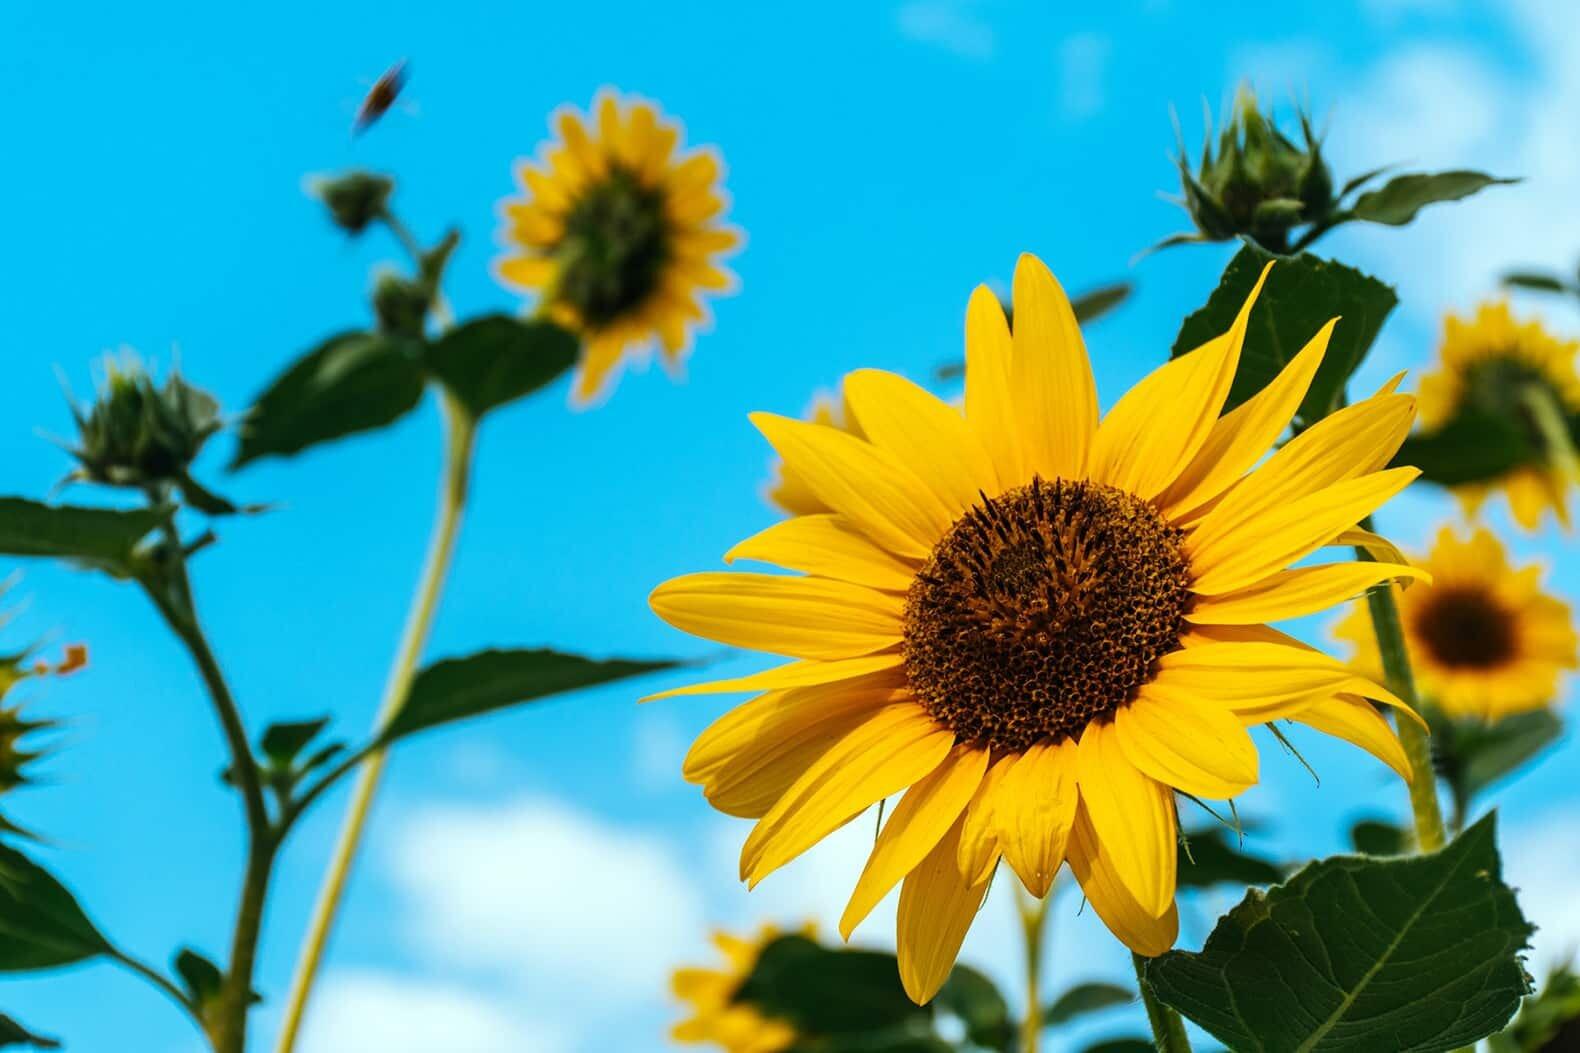 sunflower plants under a blue sky